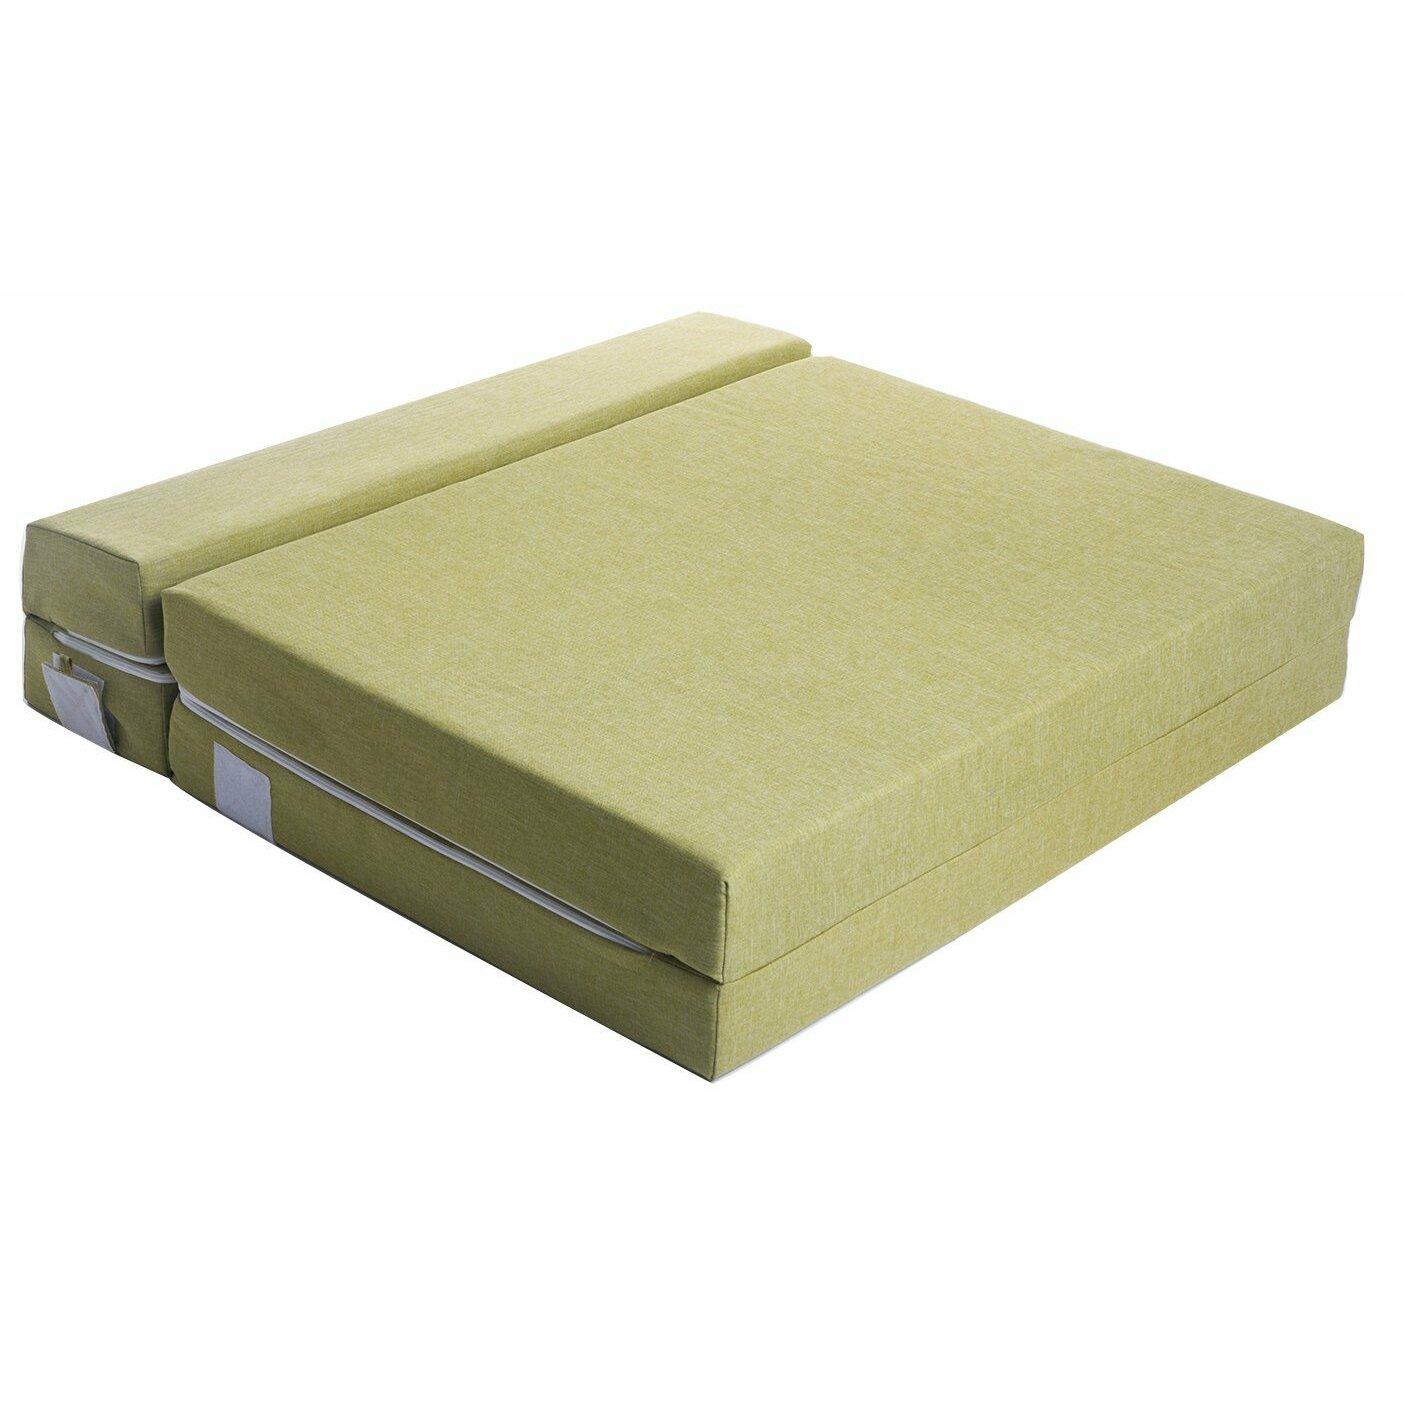 Merax 4 Gel Memory Foam Mattress